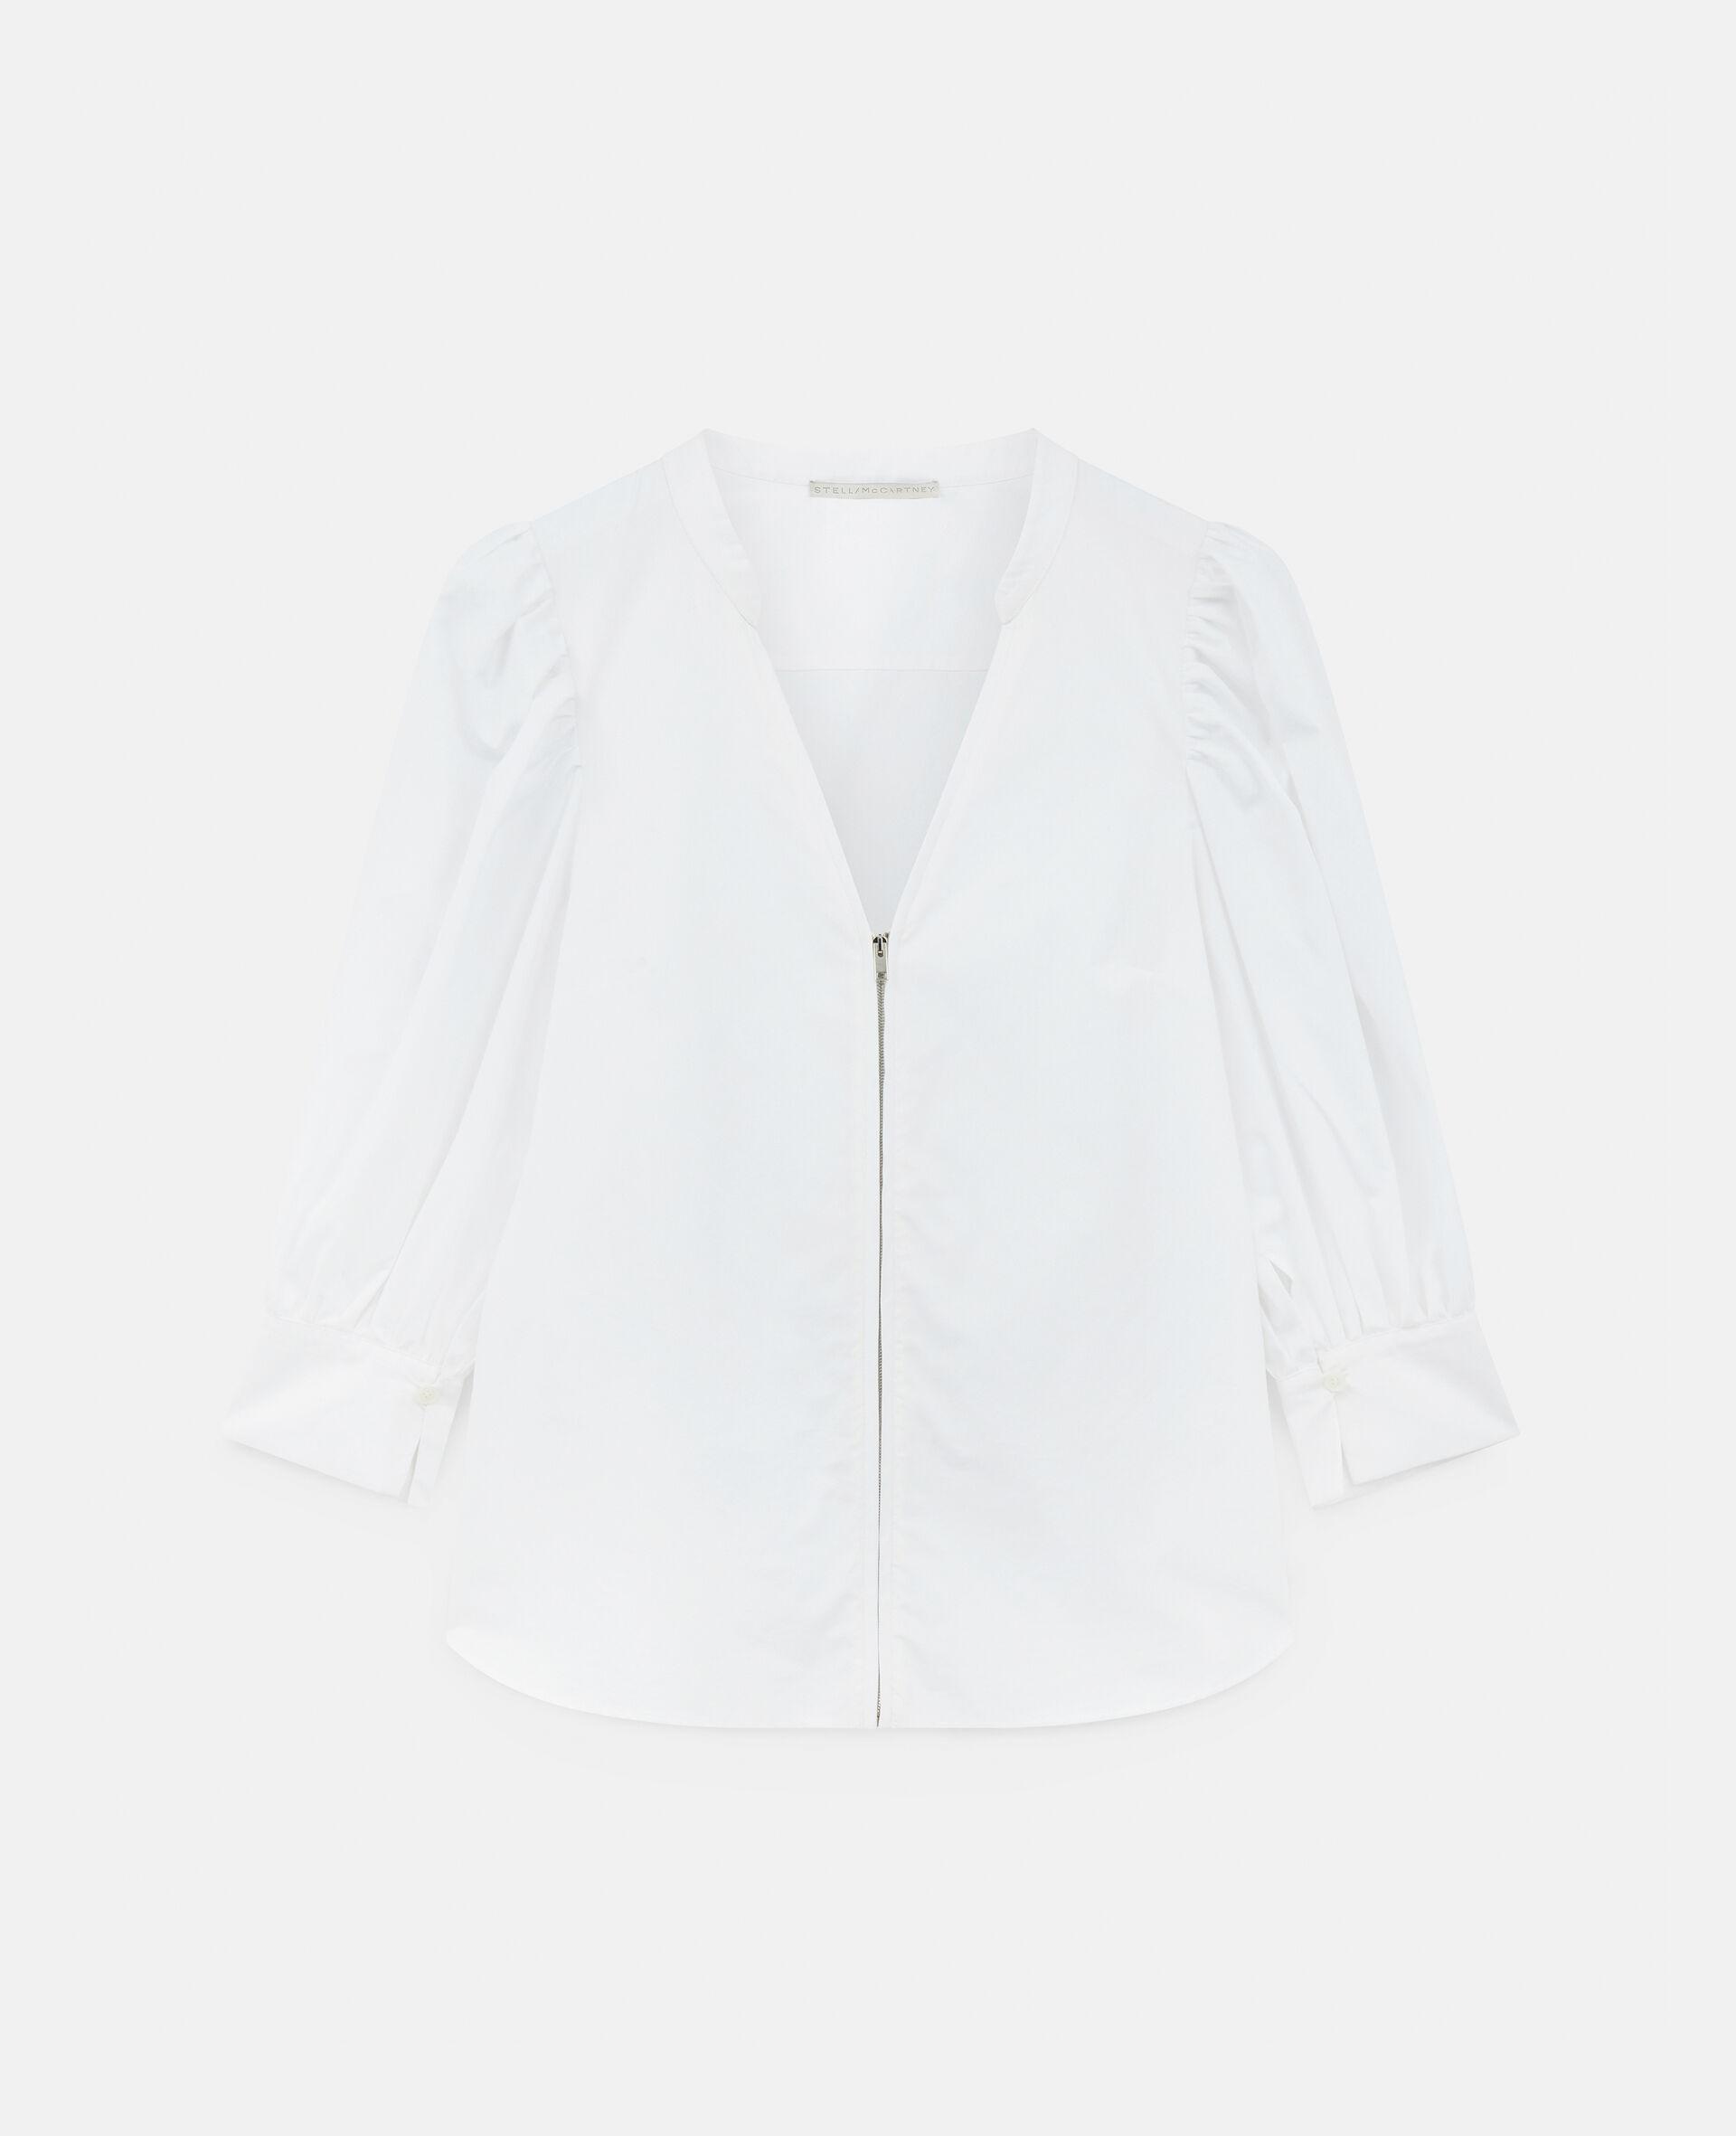 Hemd aus Baumwolle Rose-Weiß-large image number 0